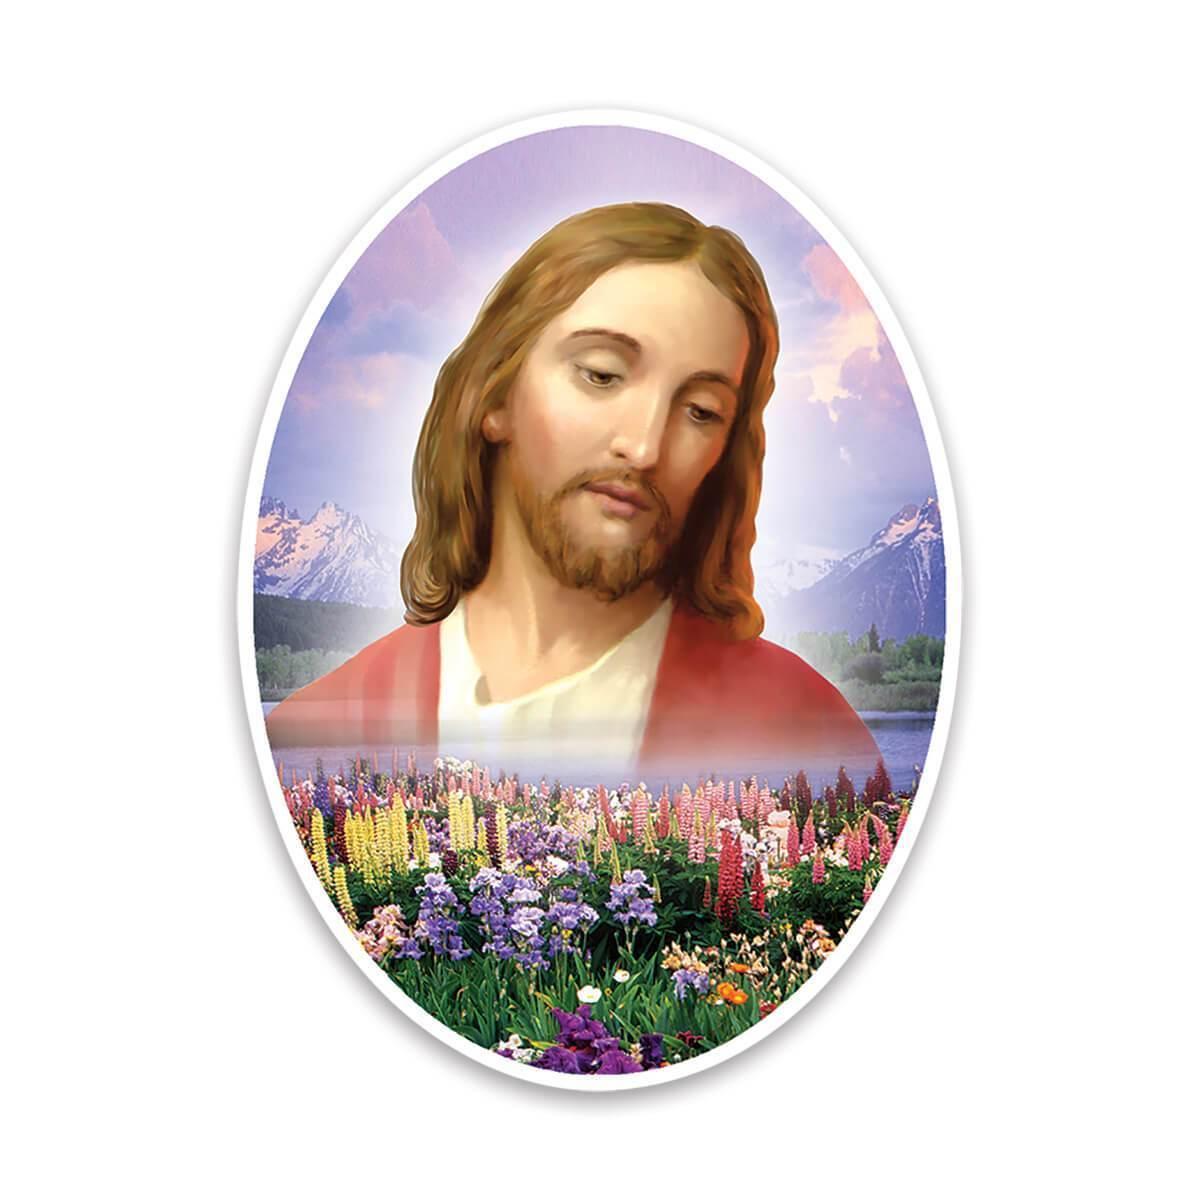 Jesus Christ : Gift Sticker Catholic Religious Religion Classic Faith